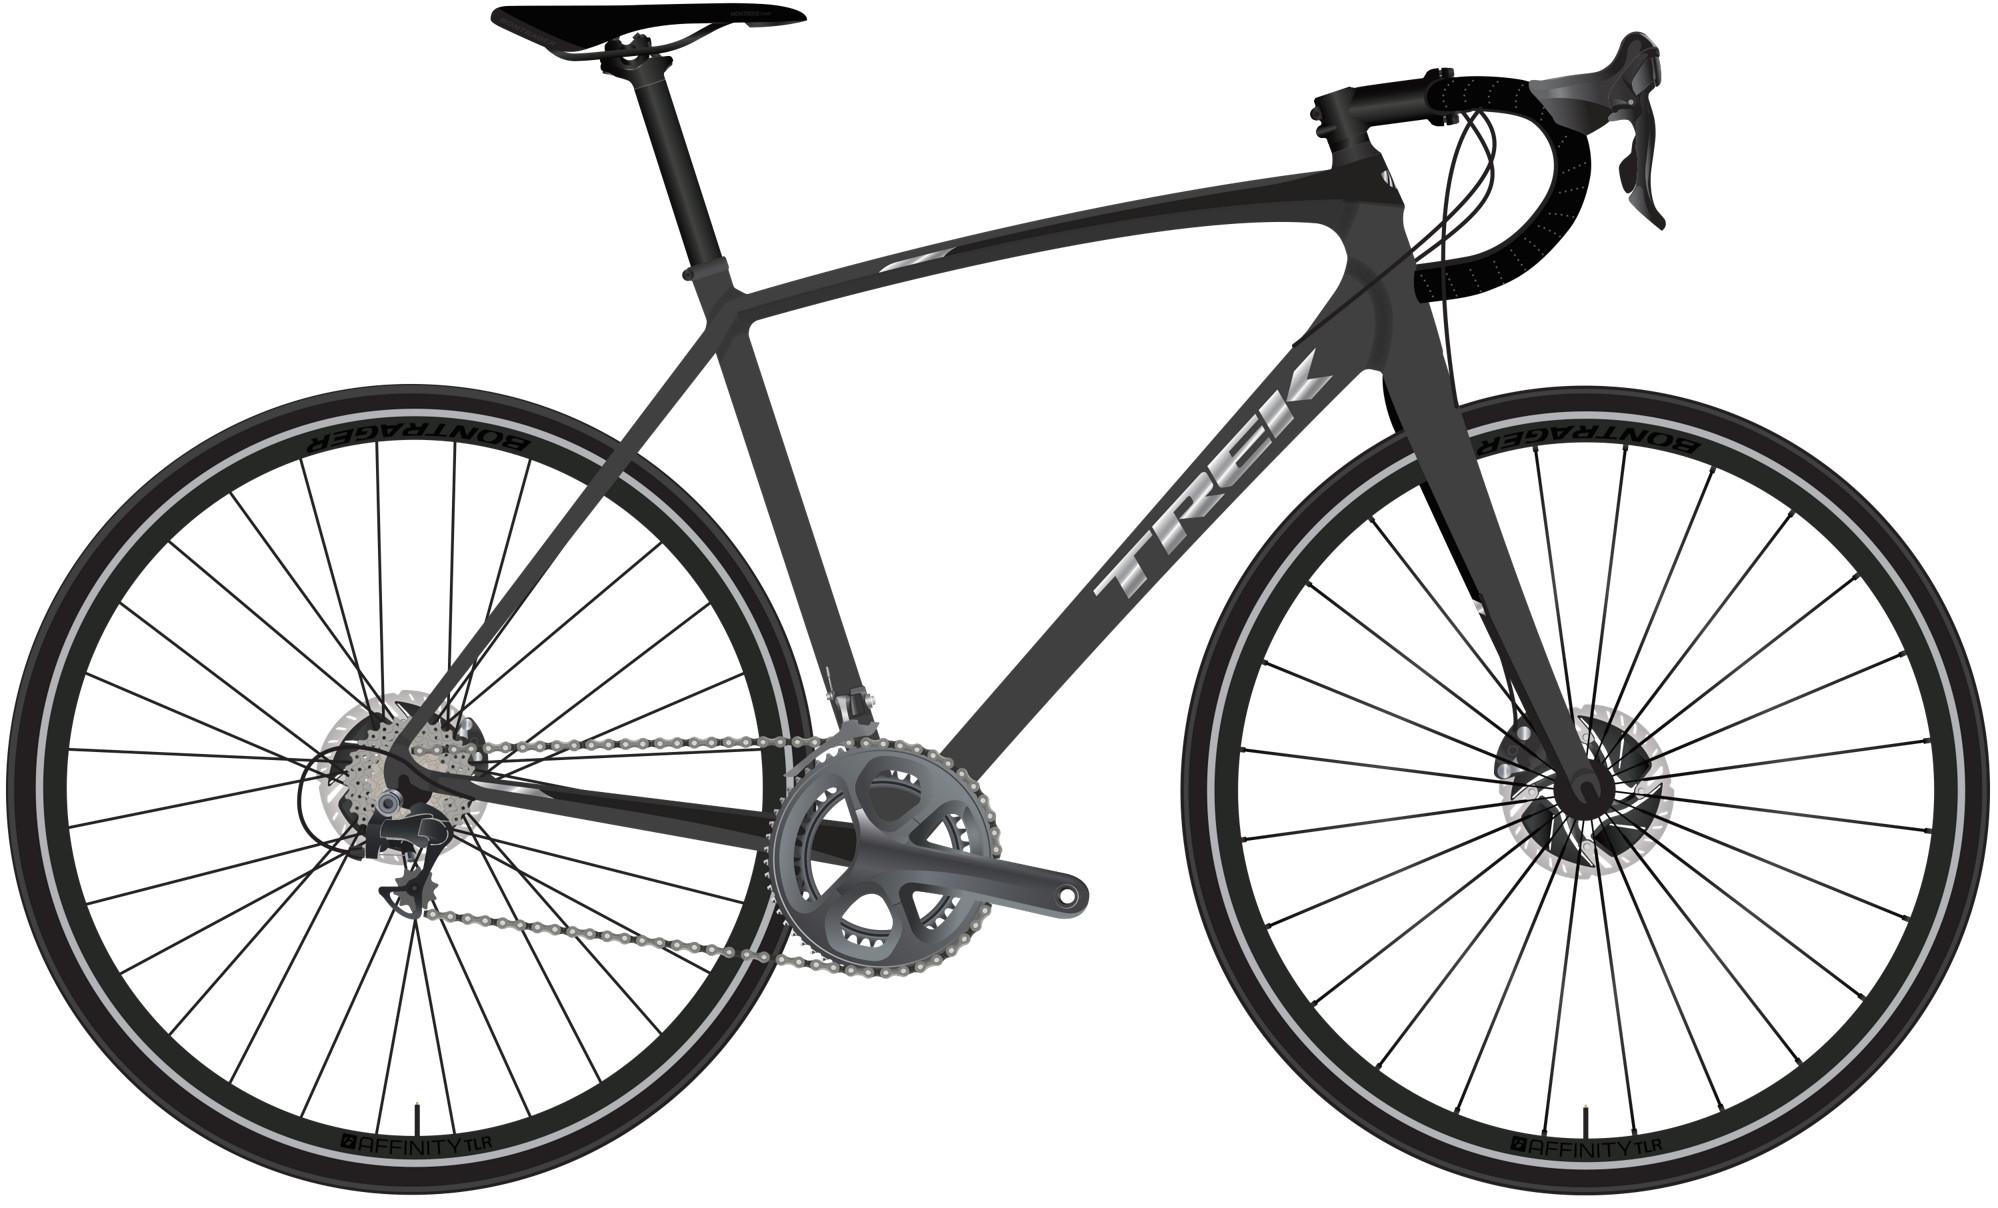 0142590d9be 2019 Trek Émonda ALR 4 Disc - Lightweight - Road Bikes - Bikes ...